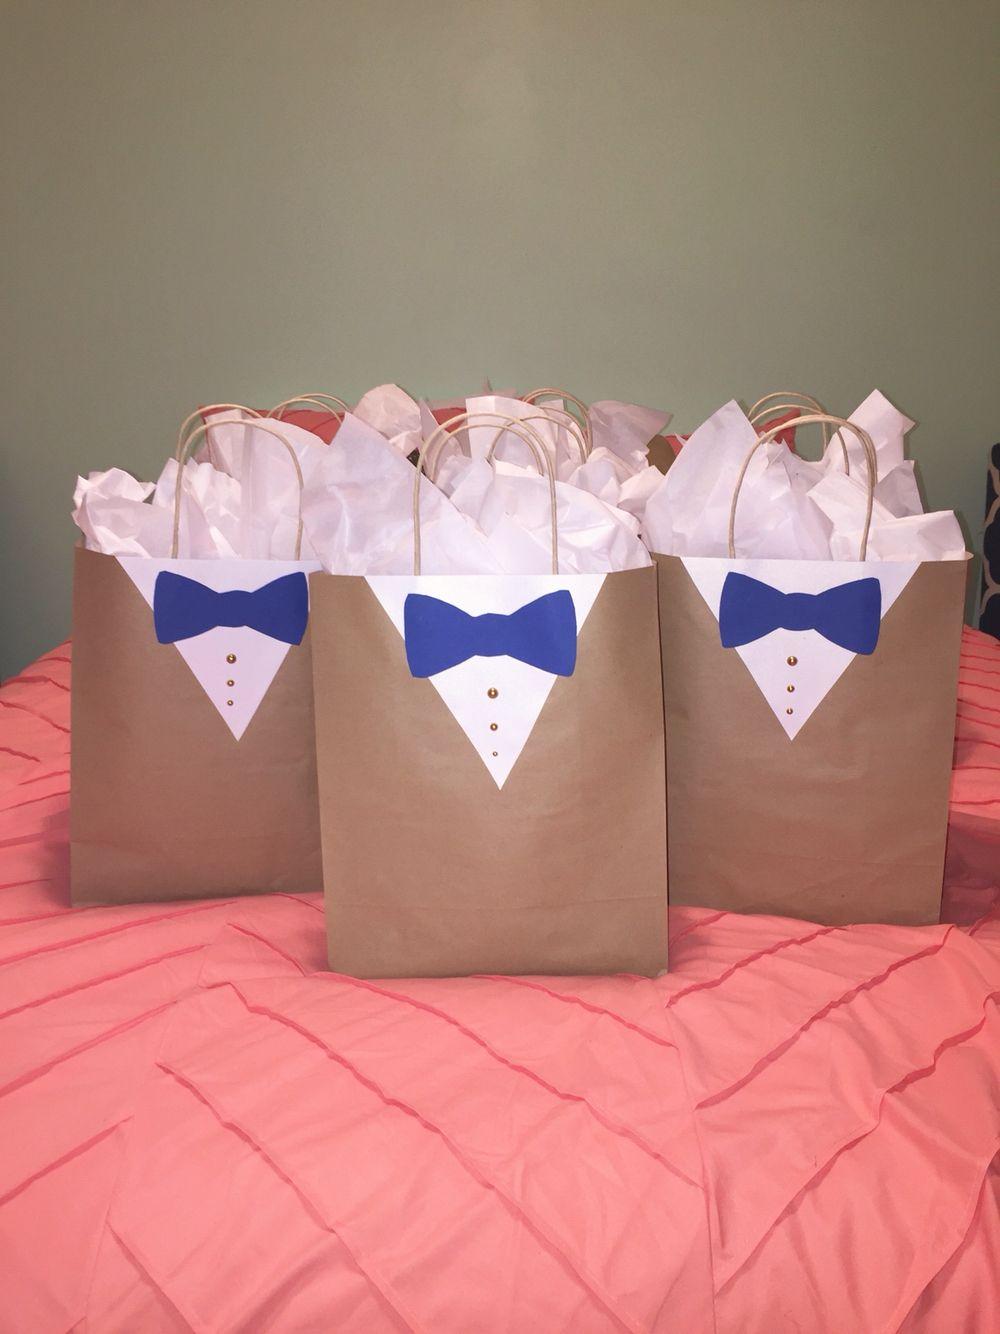 Groomsmen Gift Bag Wrapping Idea Decor Usher Gift Wedding Suit Sack